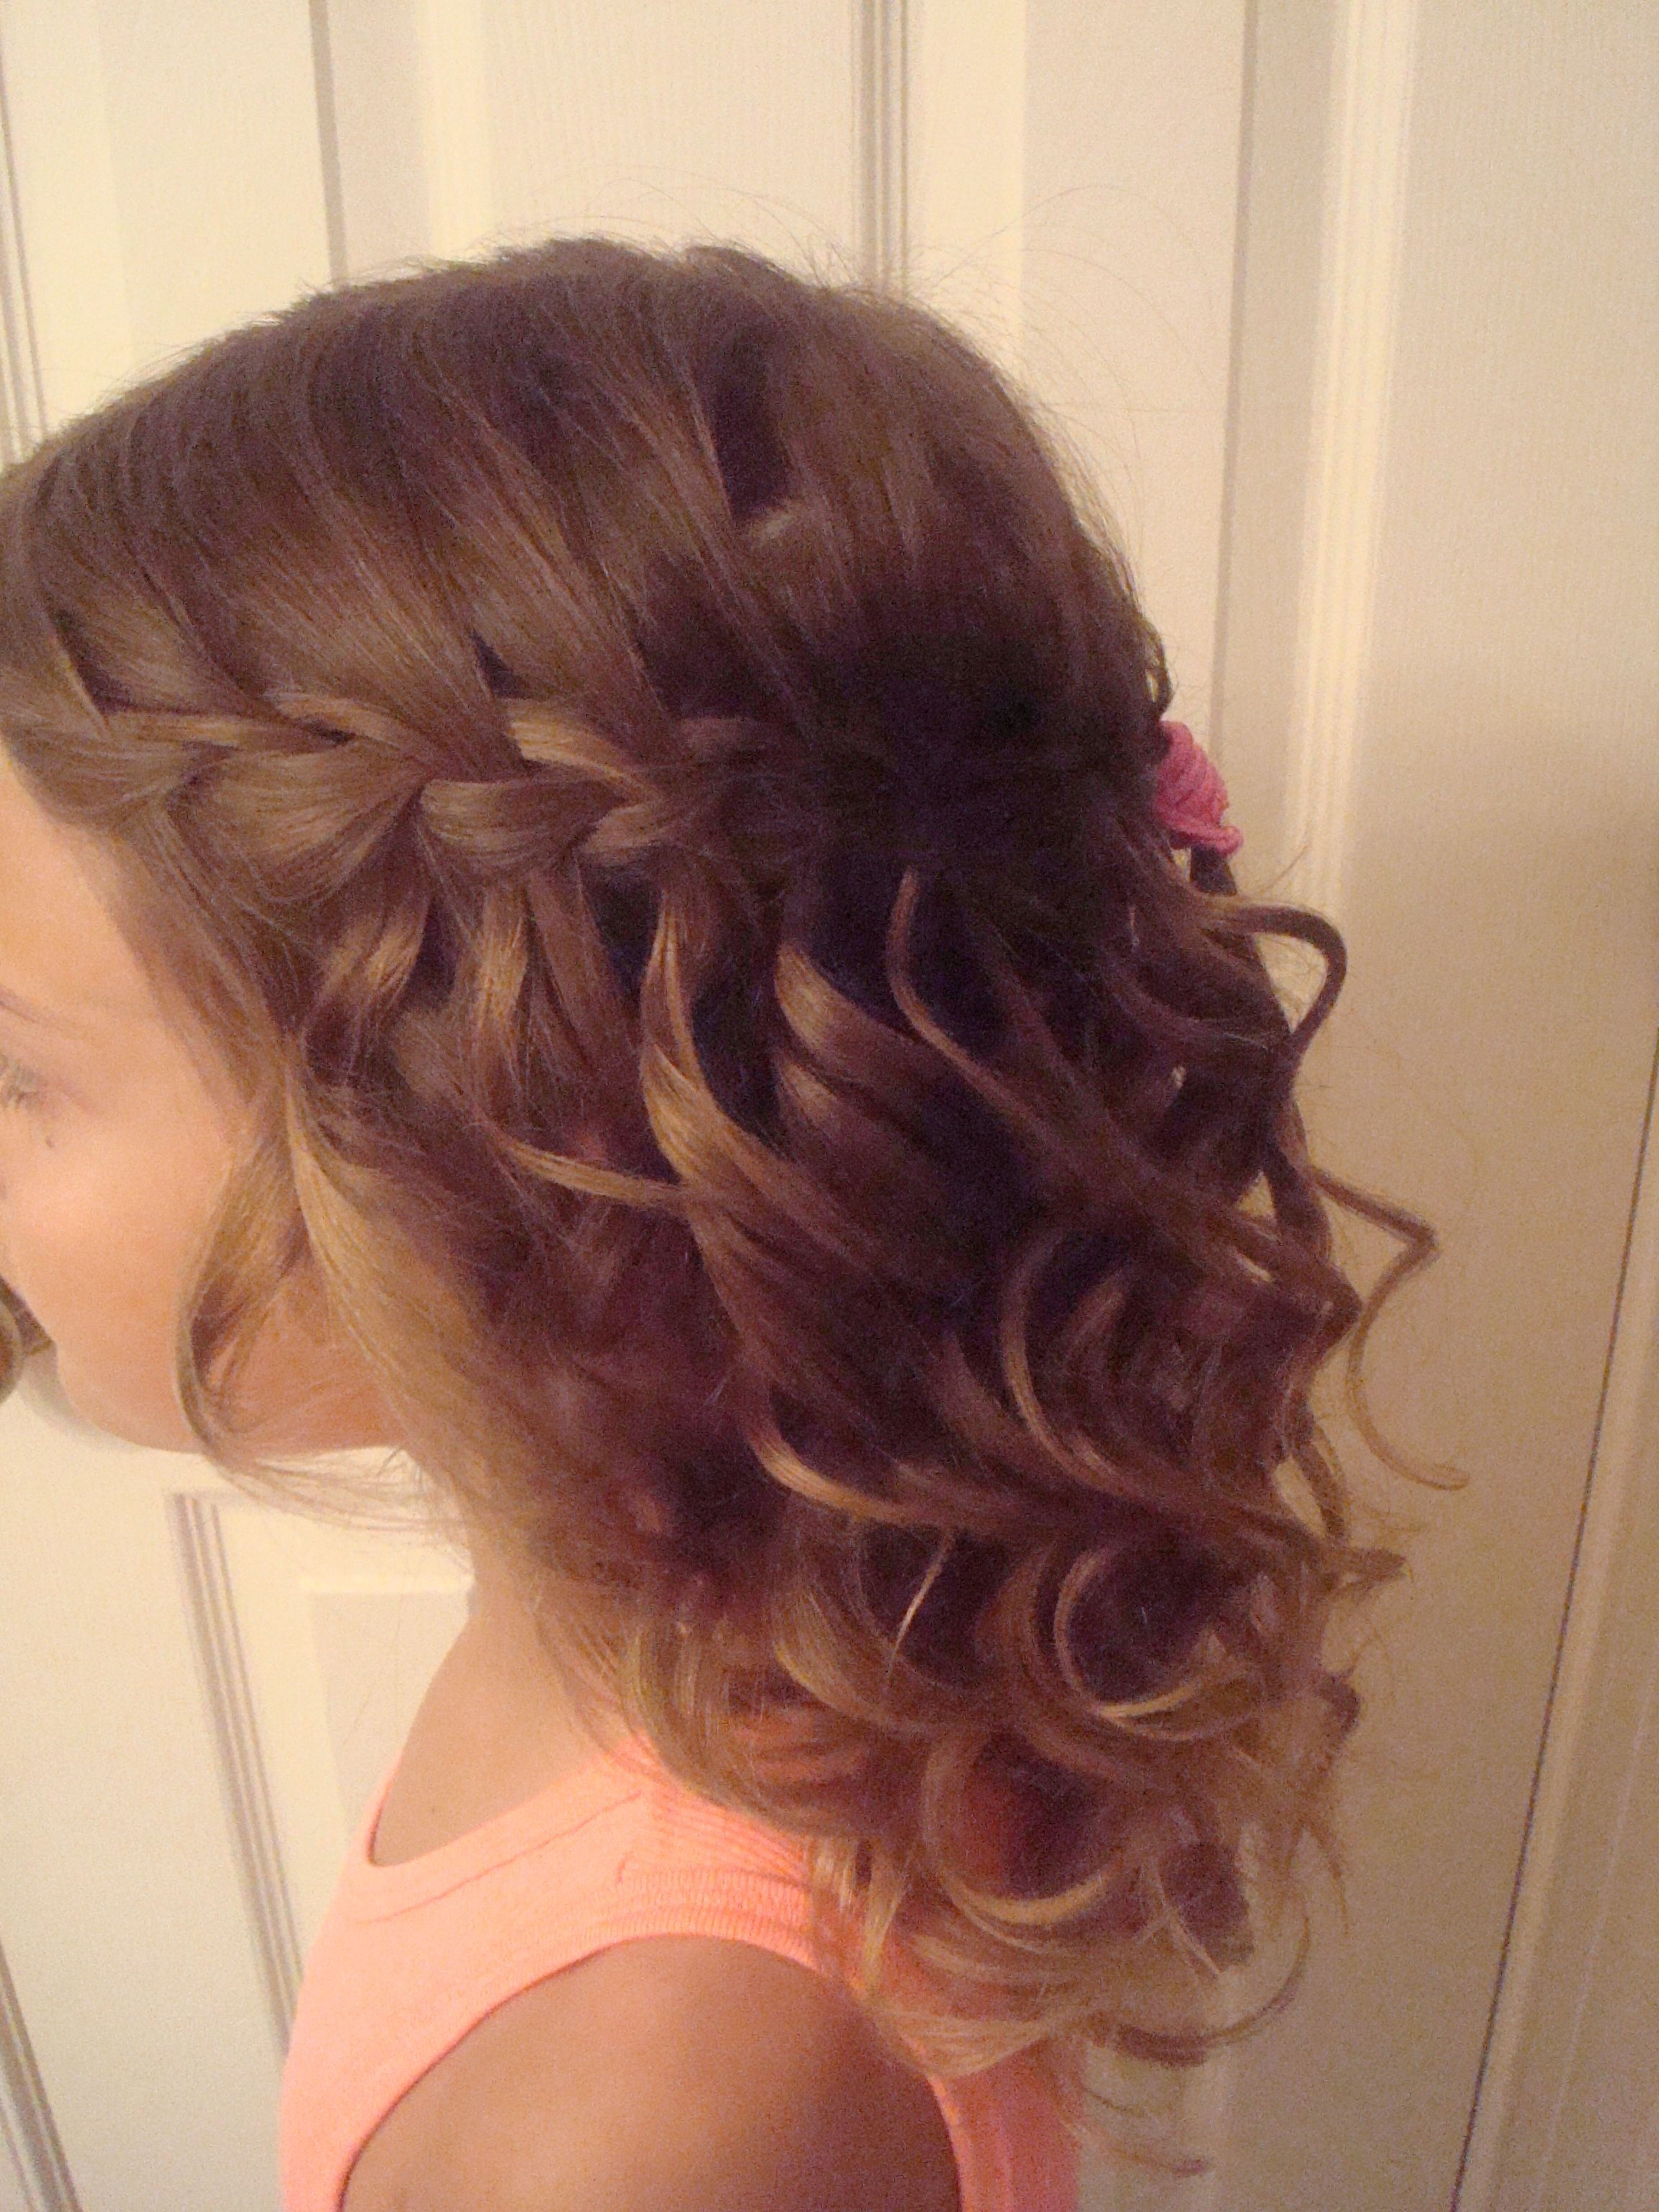 waterfall braid with curls | wedding hair | kids braided